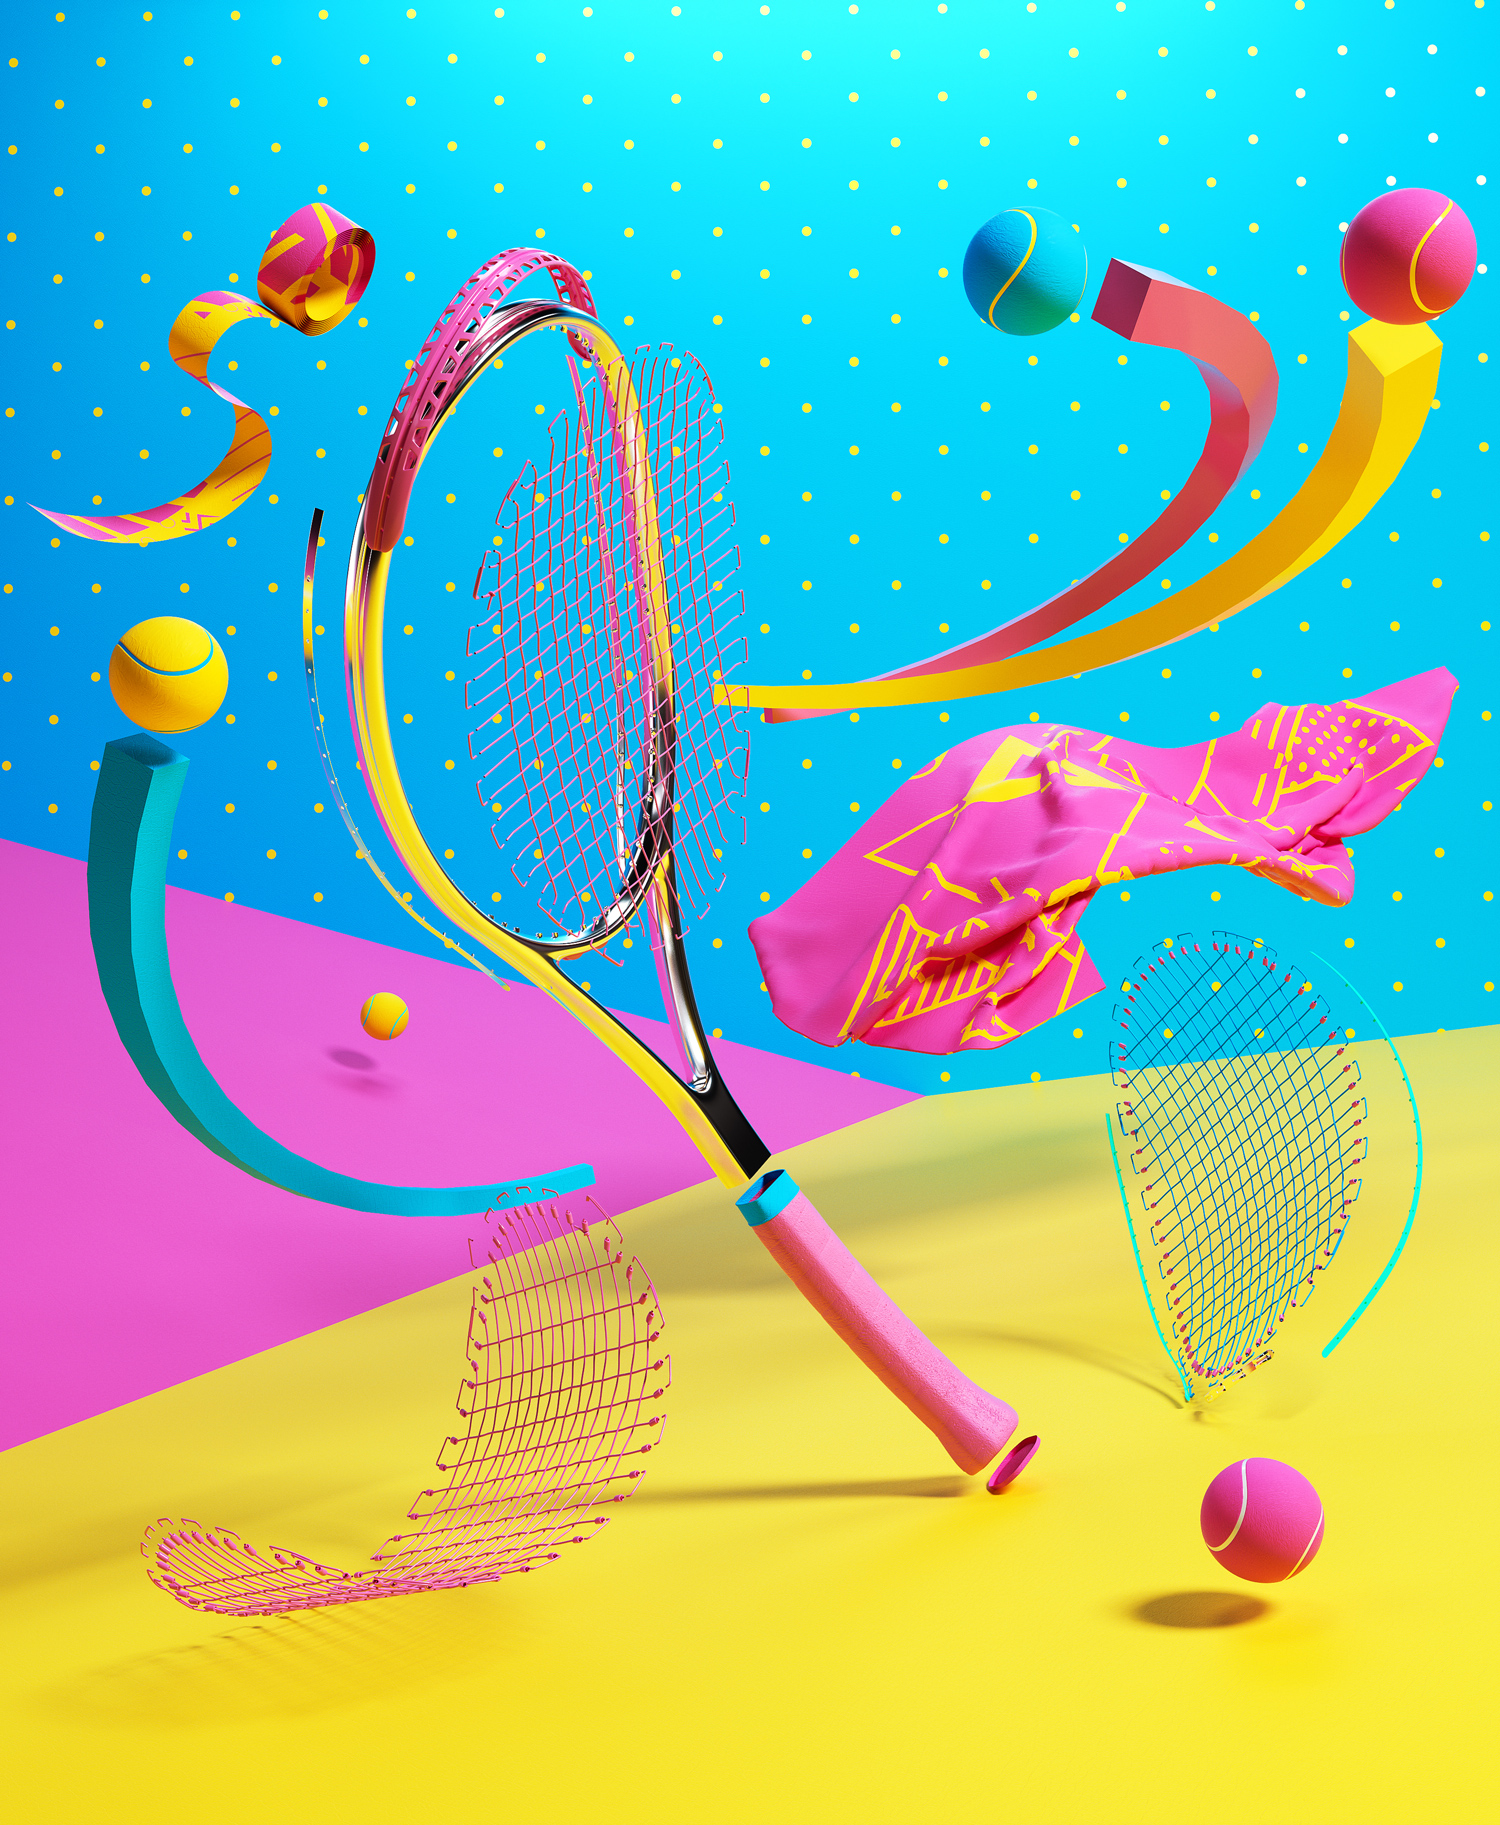 AXOO_Tennis_Sep_BenFearnley_01_WebRes.jpg